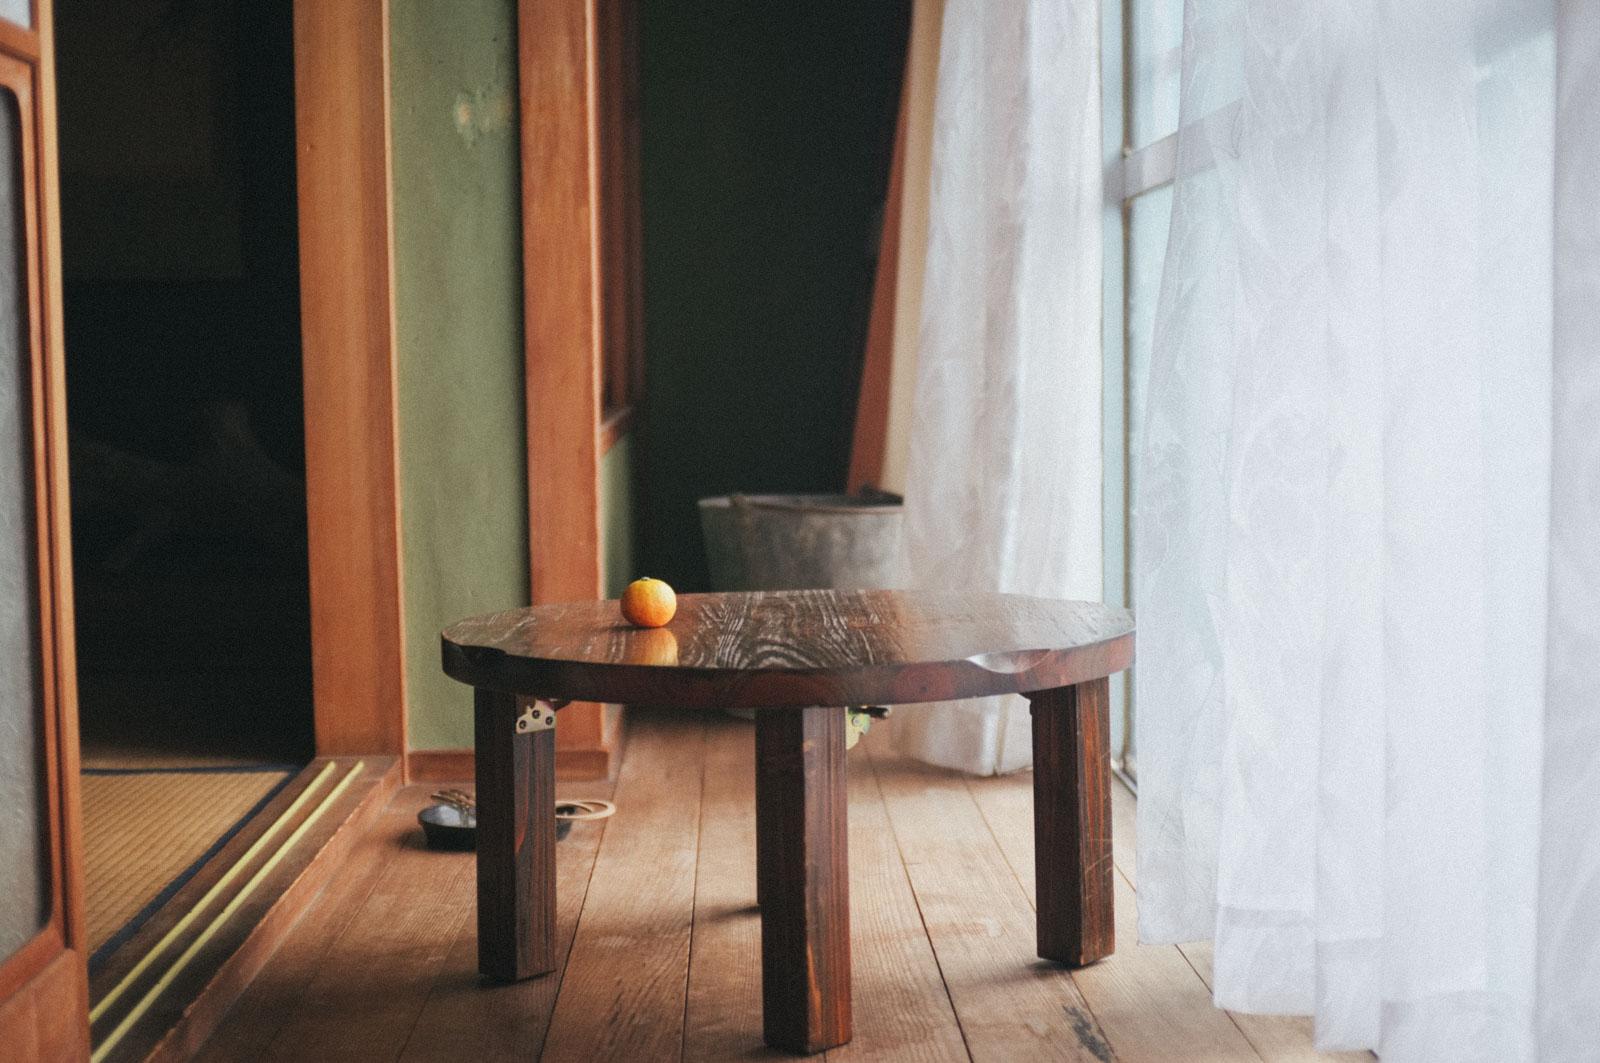 miki-airbnb-yado-002